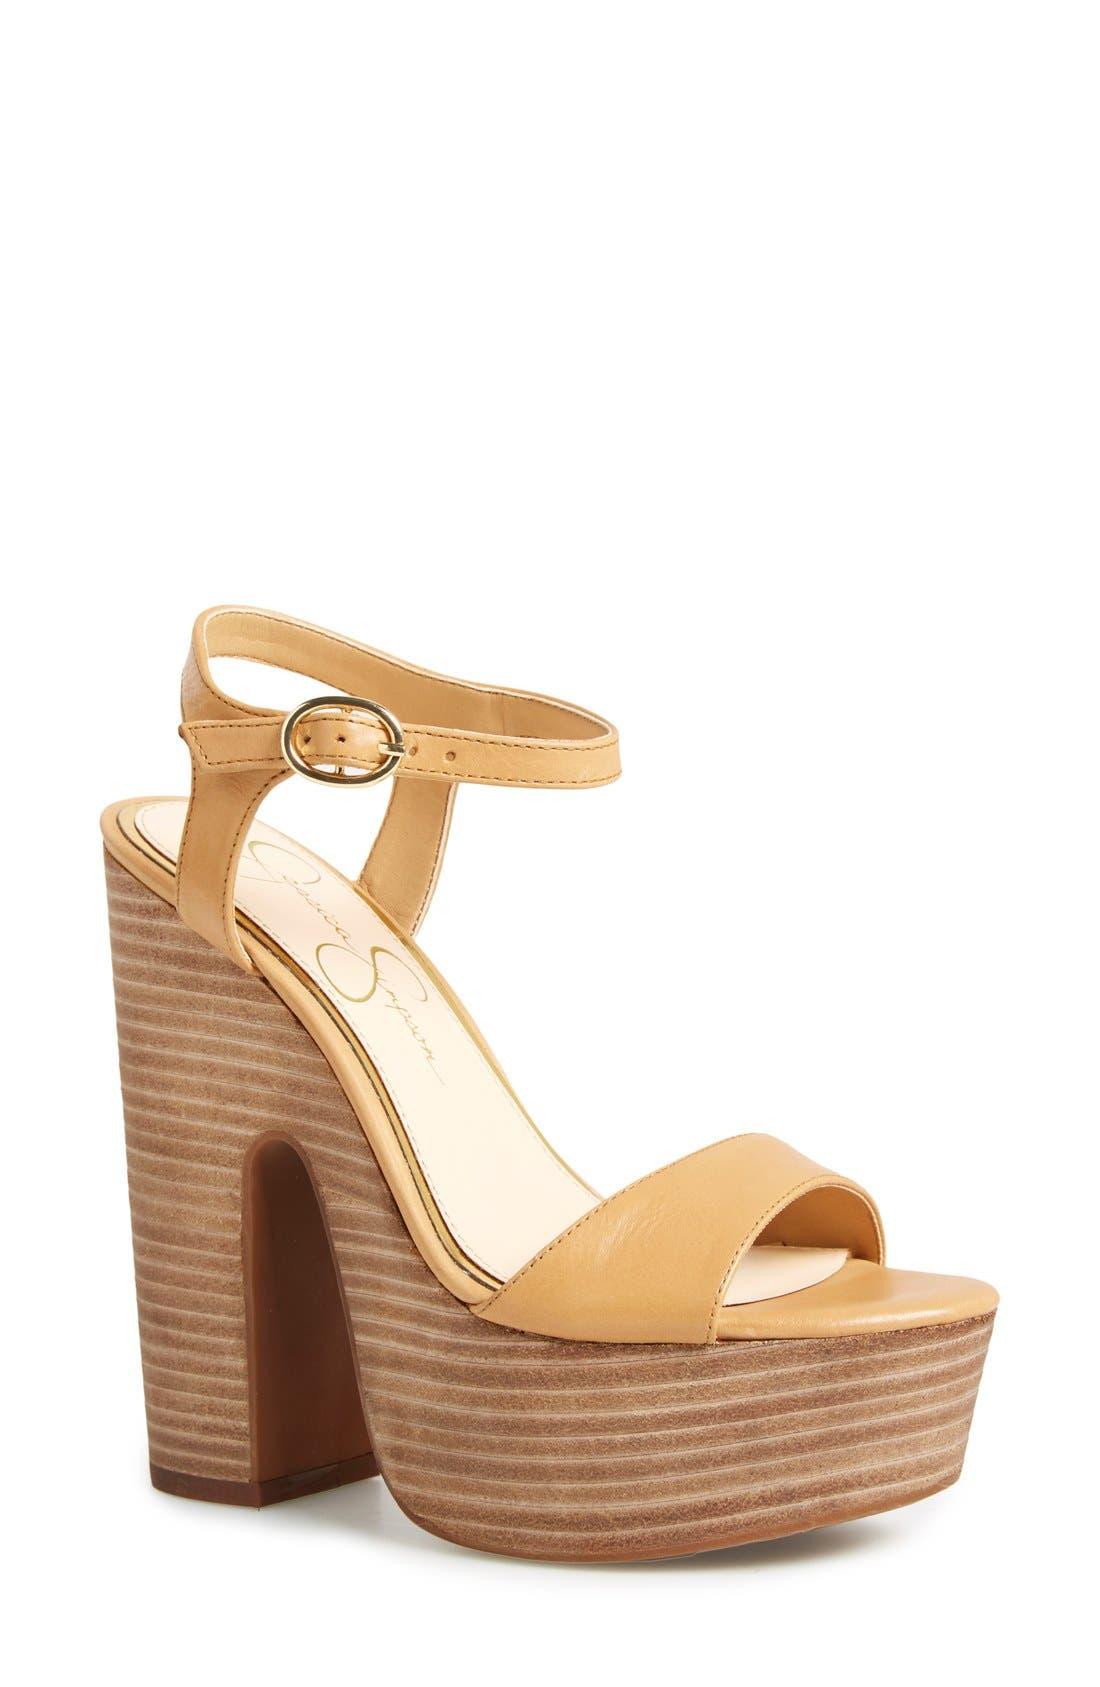 JESSICA SIMPSON 'Whirl' Platform Sandal